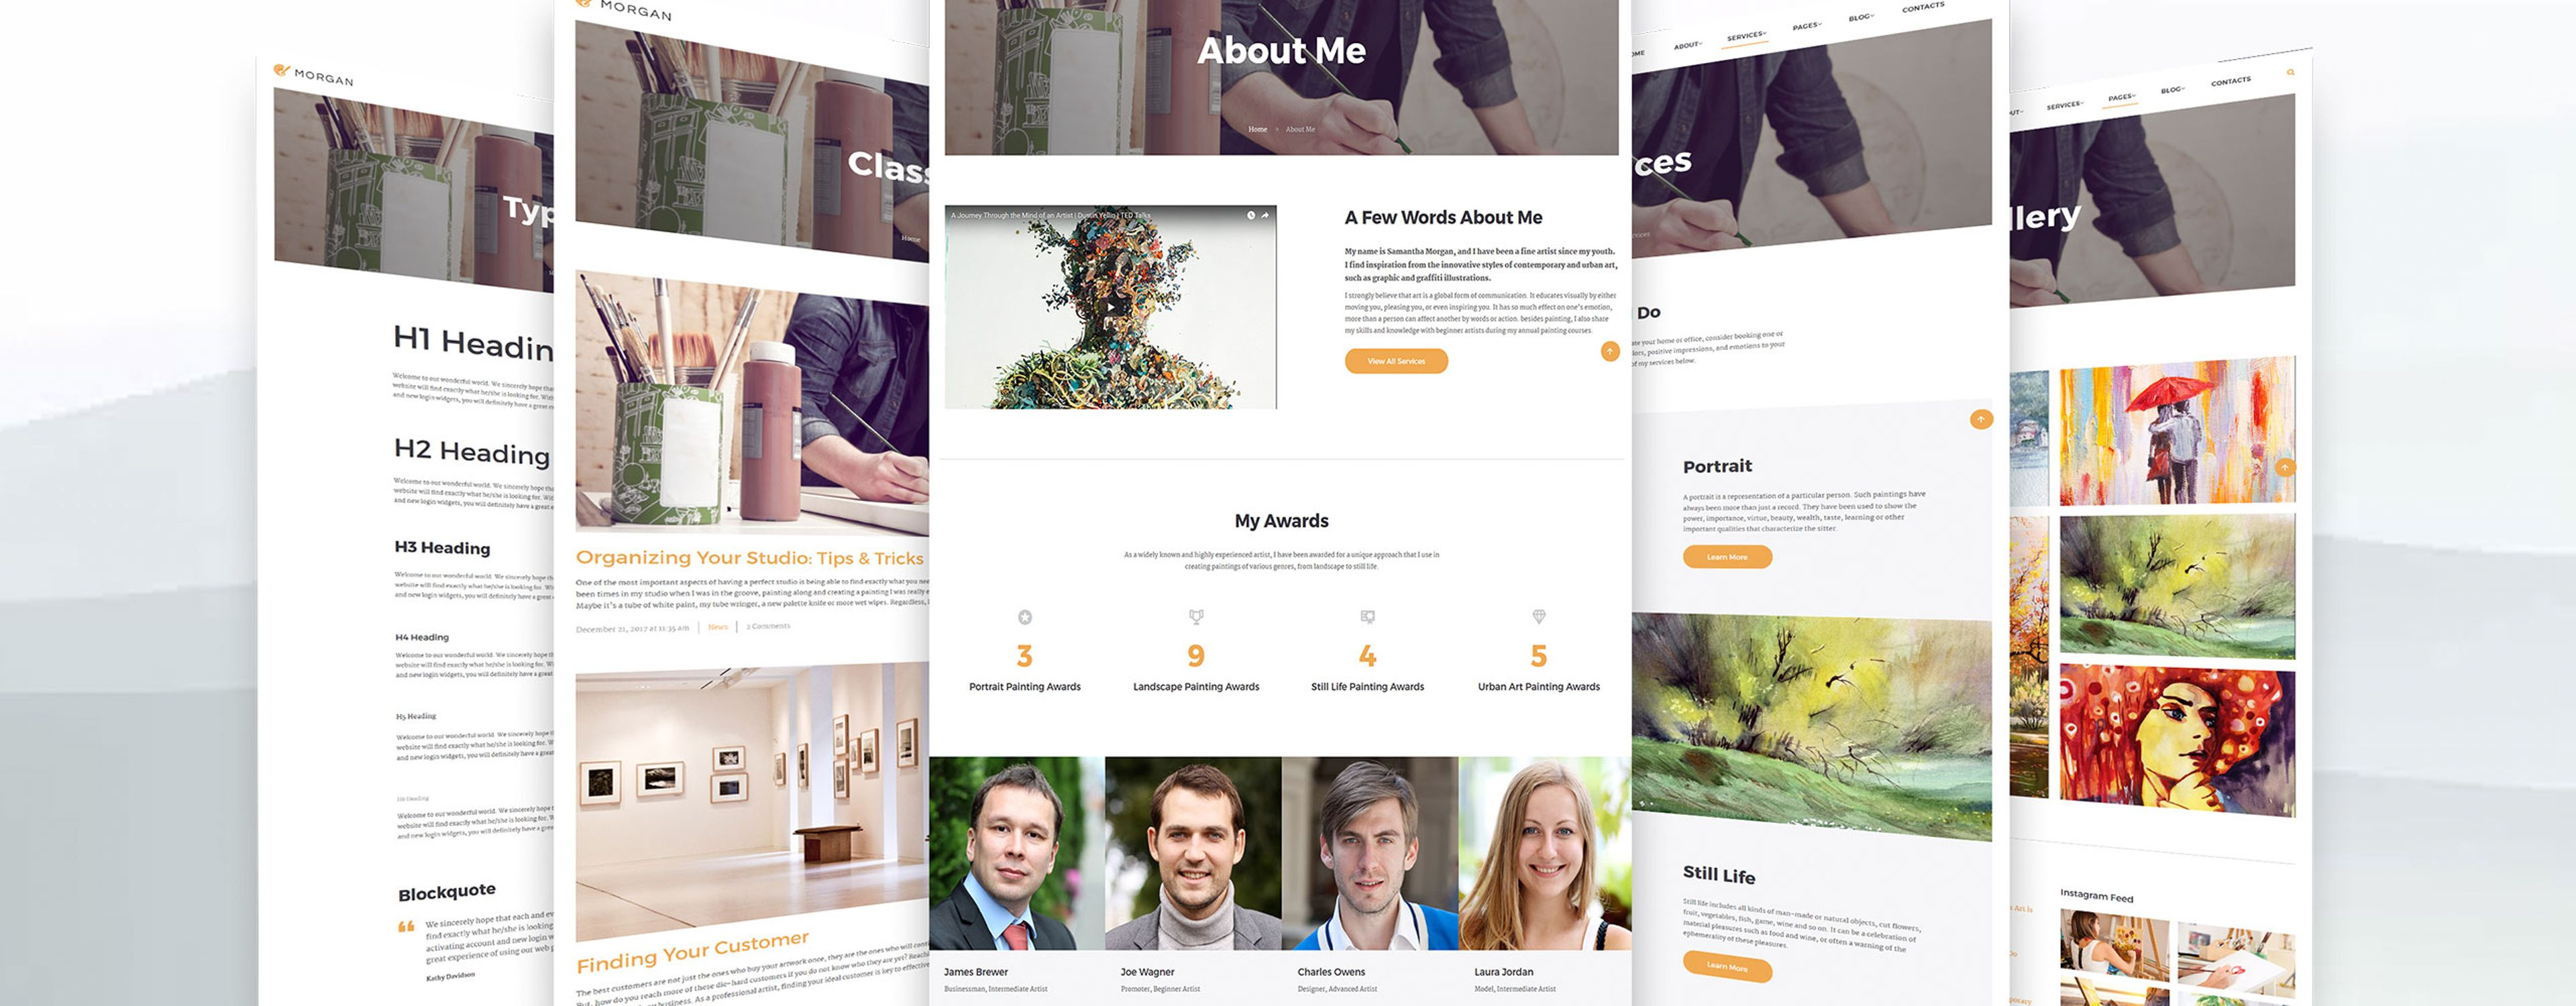 Morgan Website Template